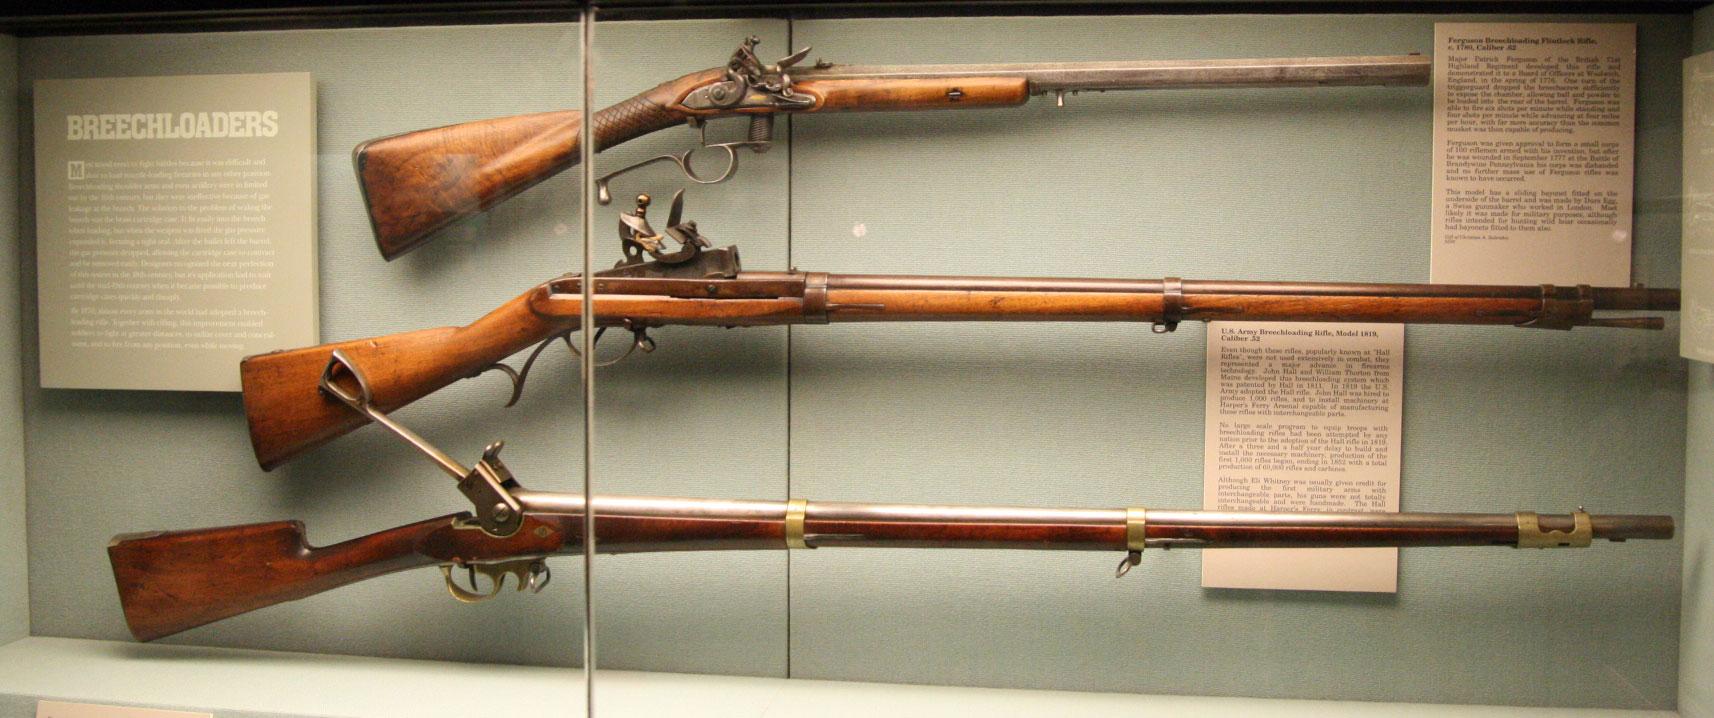 Ружья 18 века